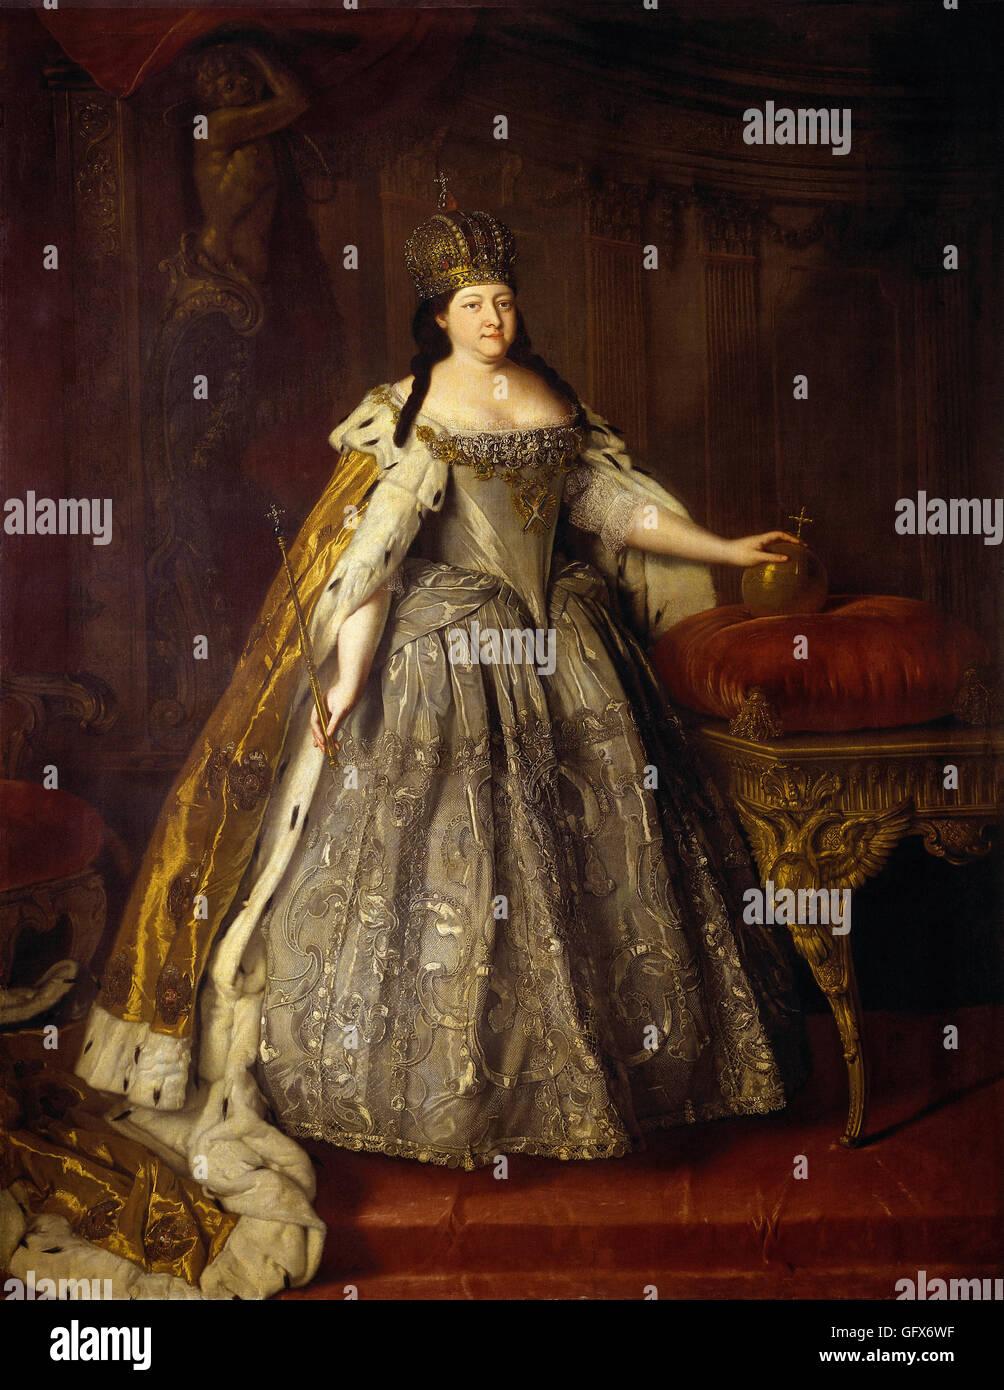 Louis Caravaque-Portrait Emperor - Stock Image